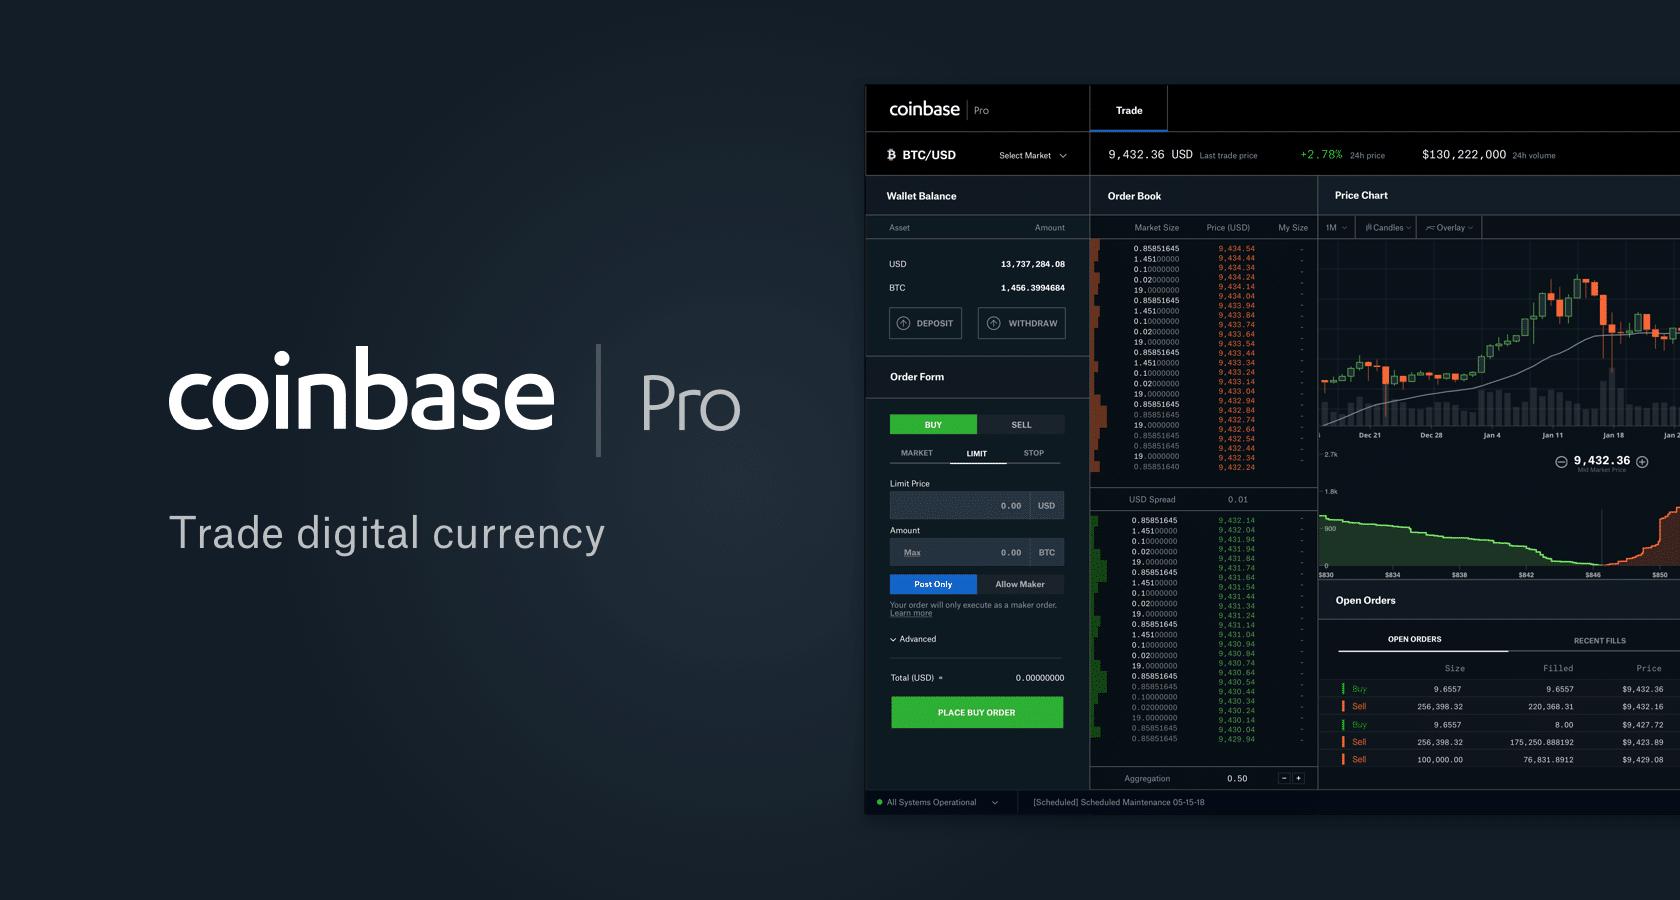 Universal Market Access (UMA) sbarca su Coinbase Pro